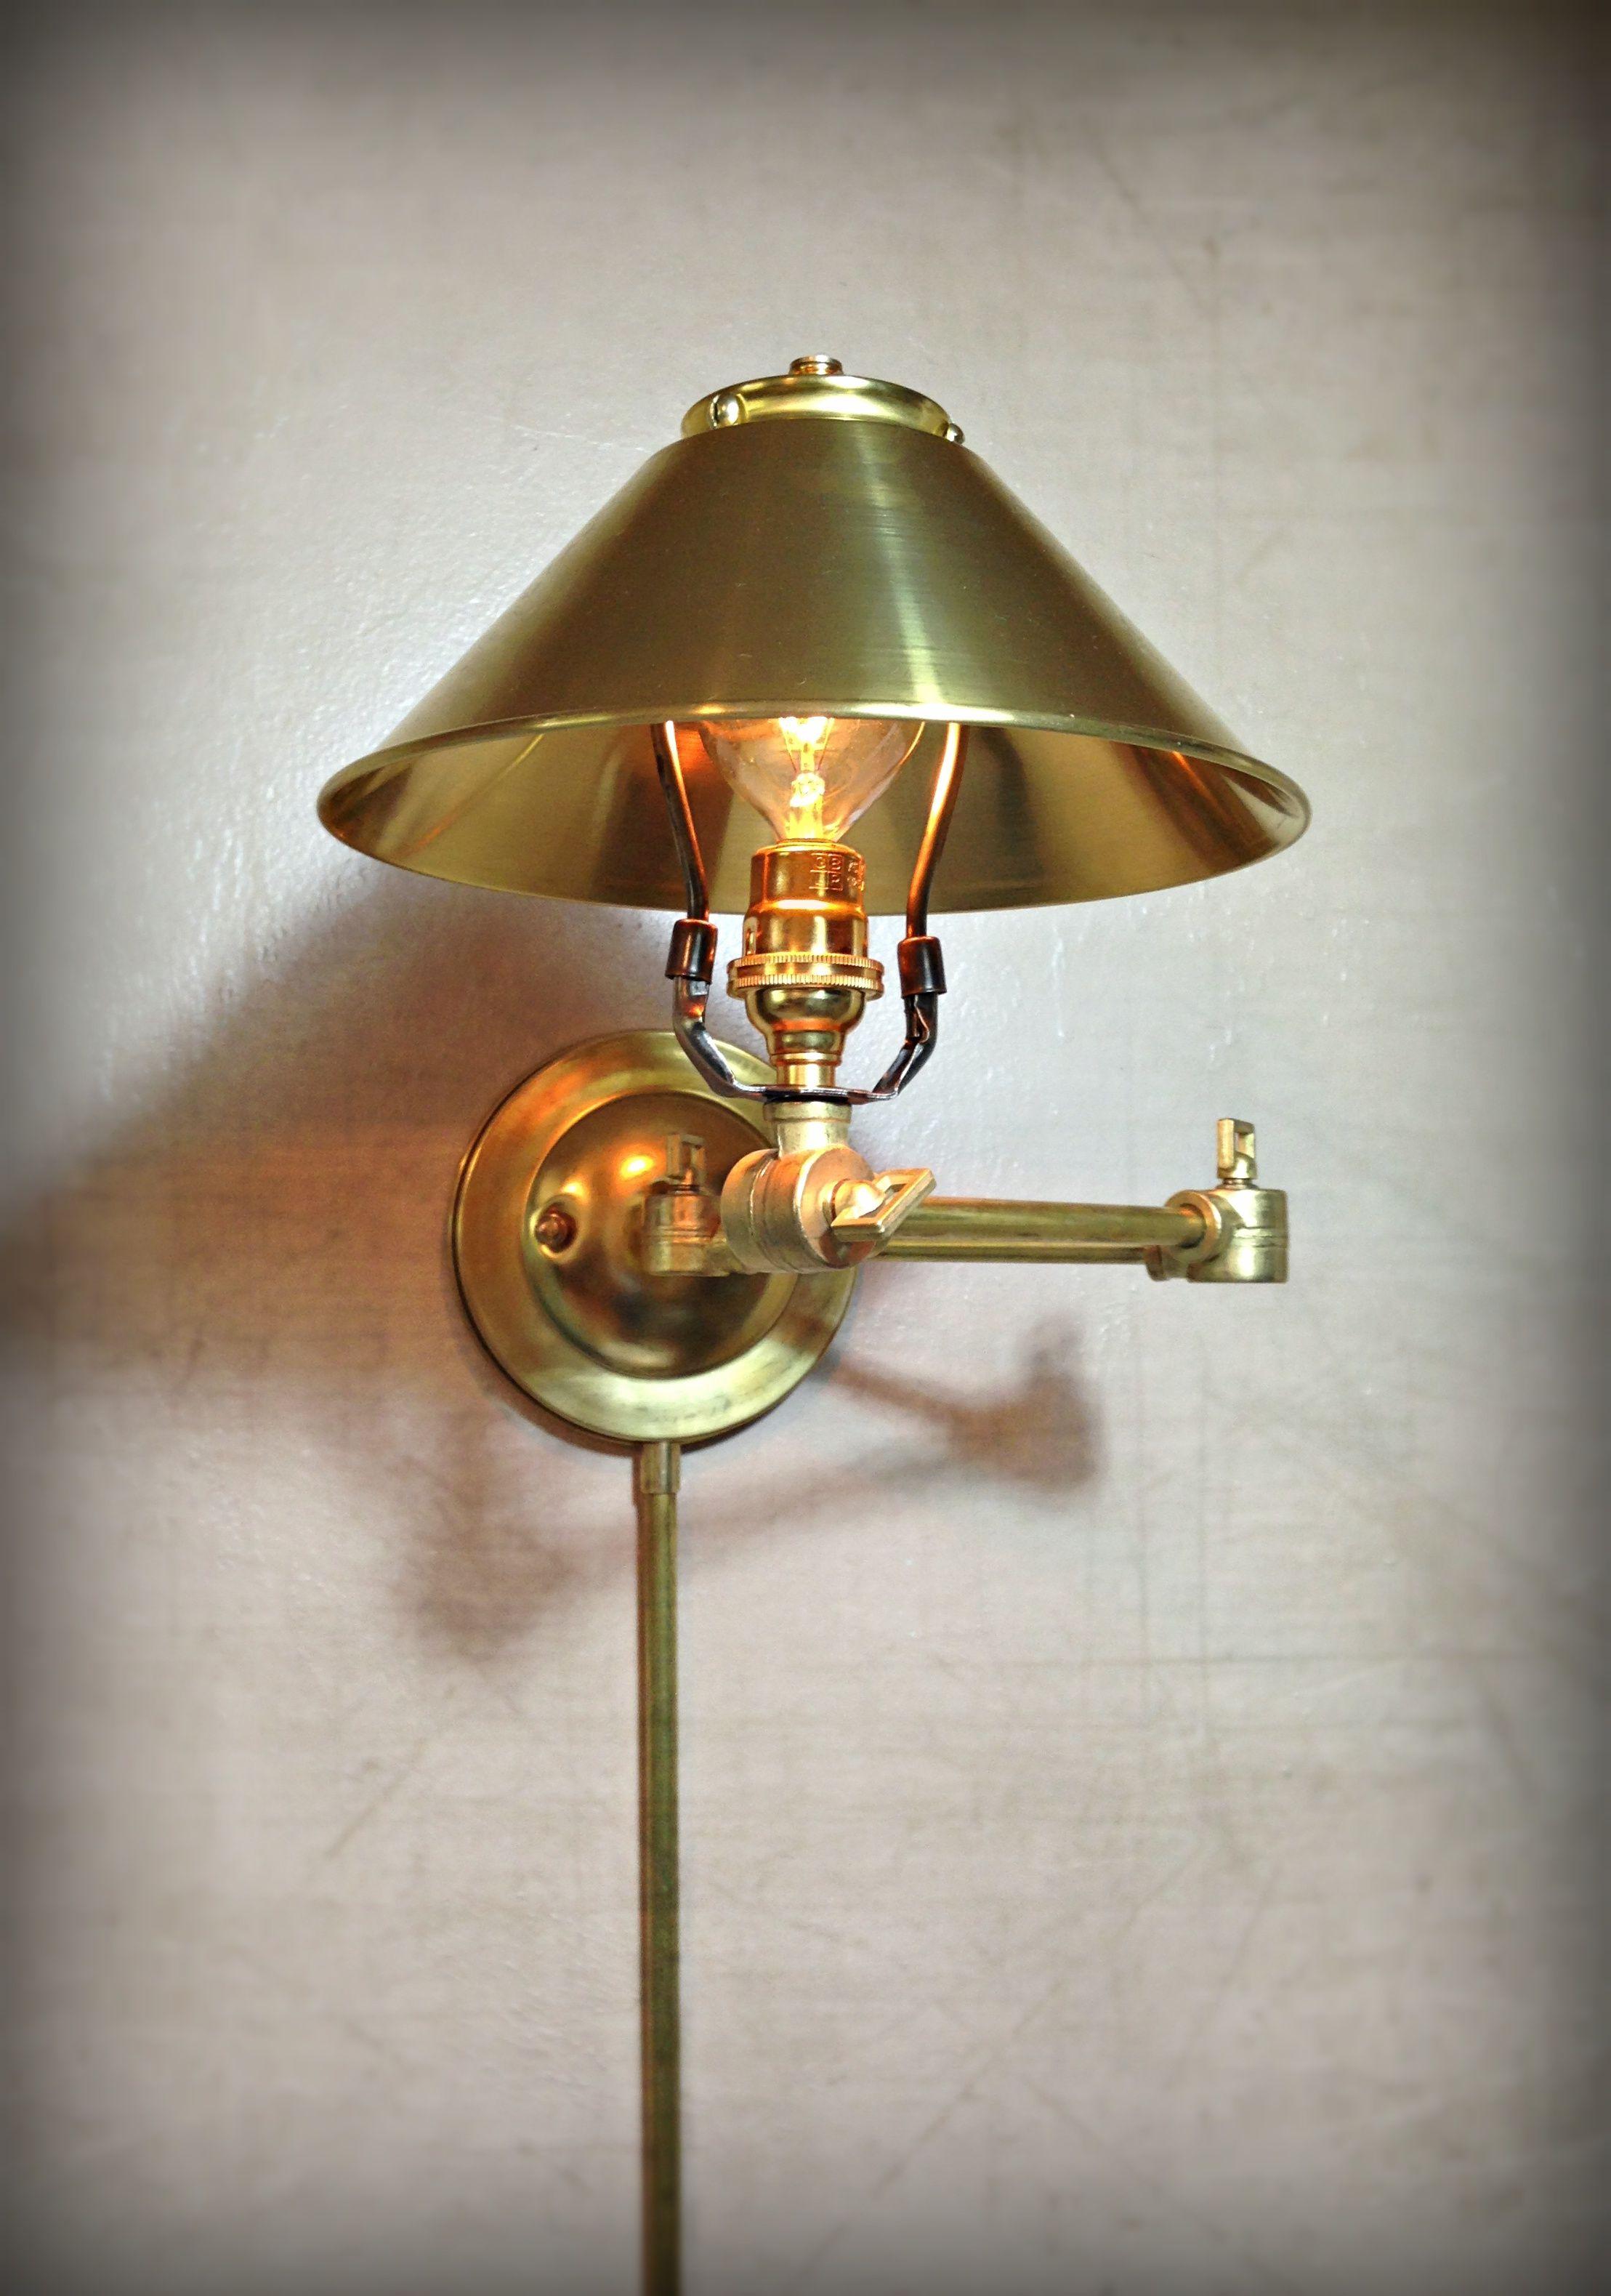 Buy Handmade Adjustable Articulating Wall Mount Light ... on Plugin Wall Sconce Lights id=12811